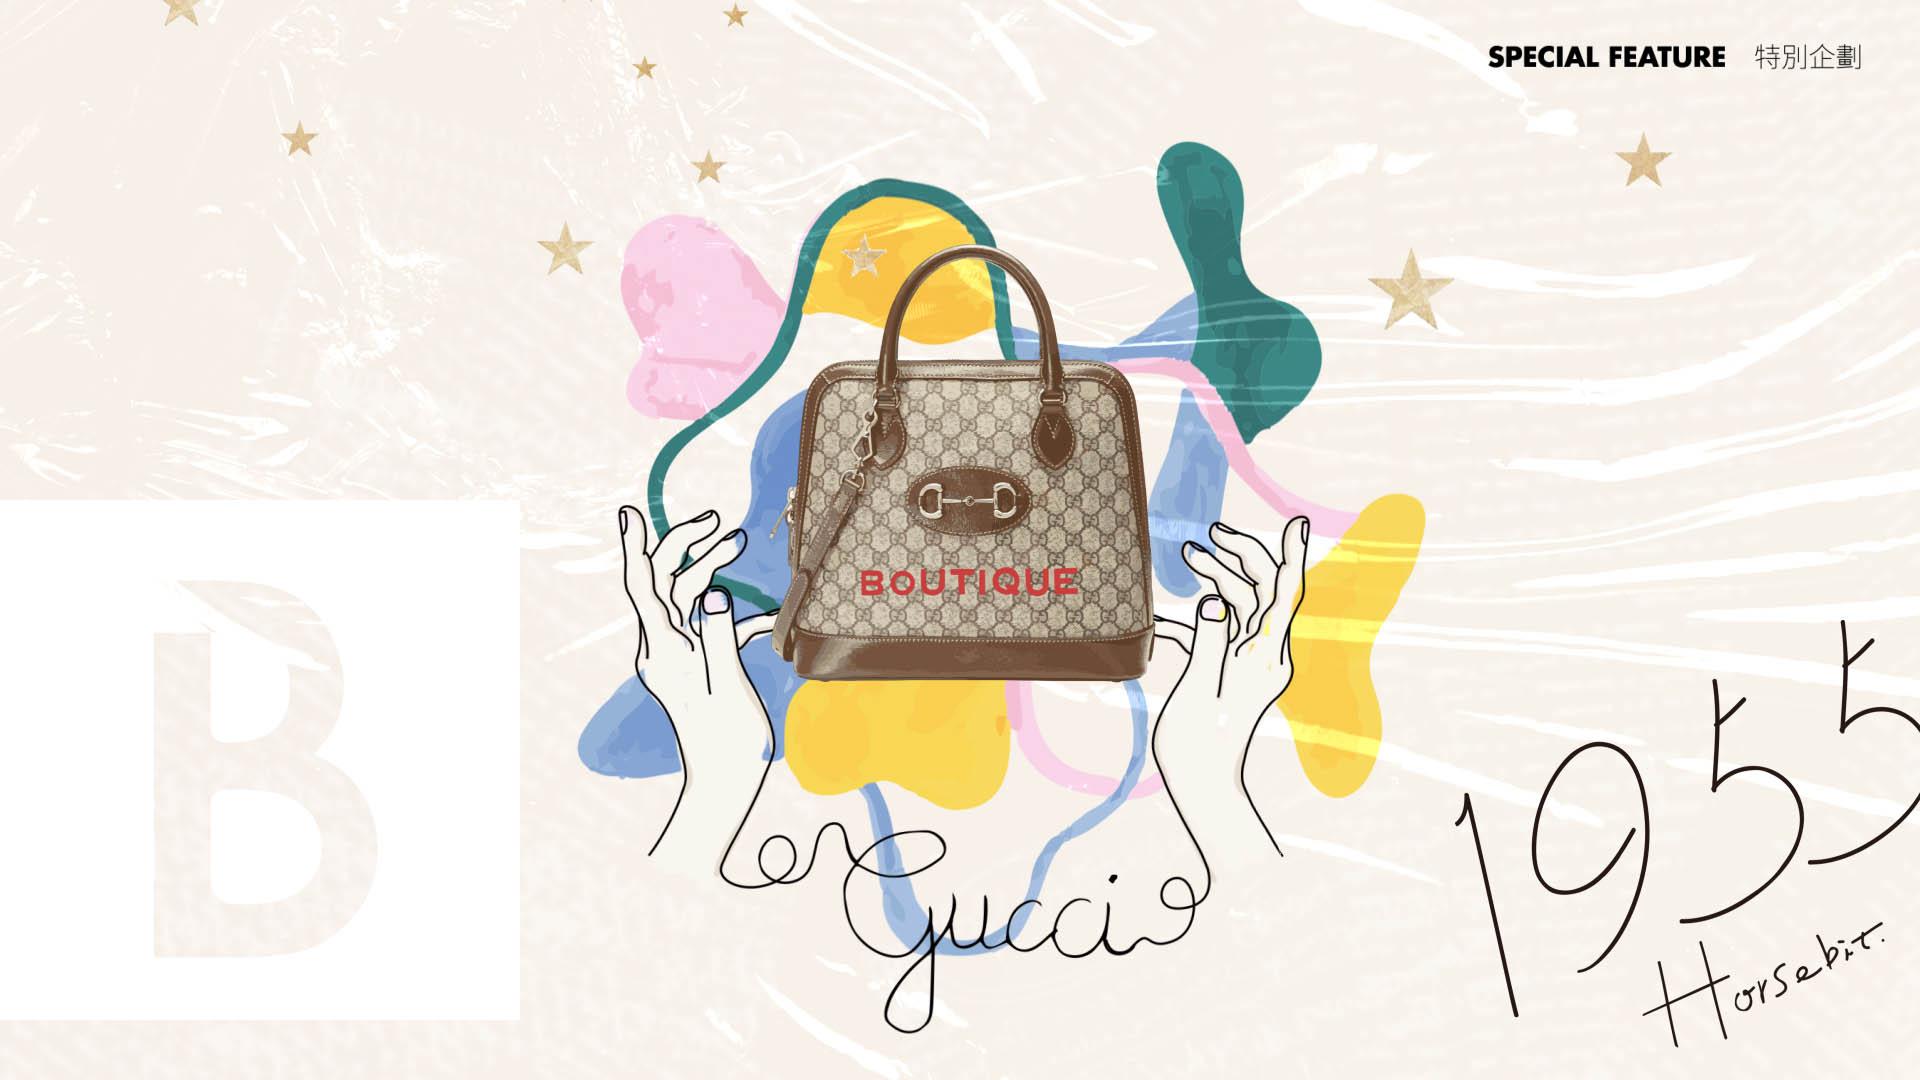 Gucci「Horsebit 1955」竄升品牌新經典包款!承襲馬術淵源,「GG Supreme」上字版實在太吸睛│Bella Taiwan